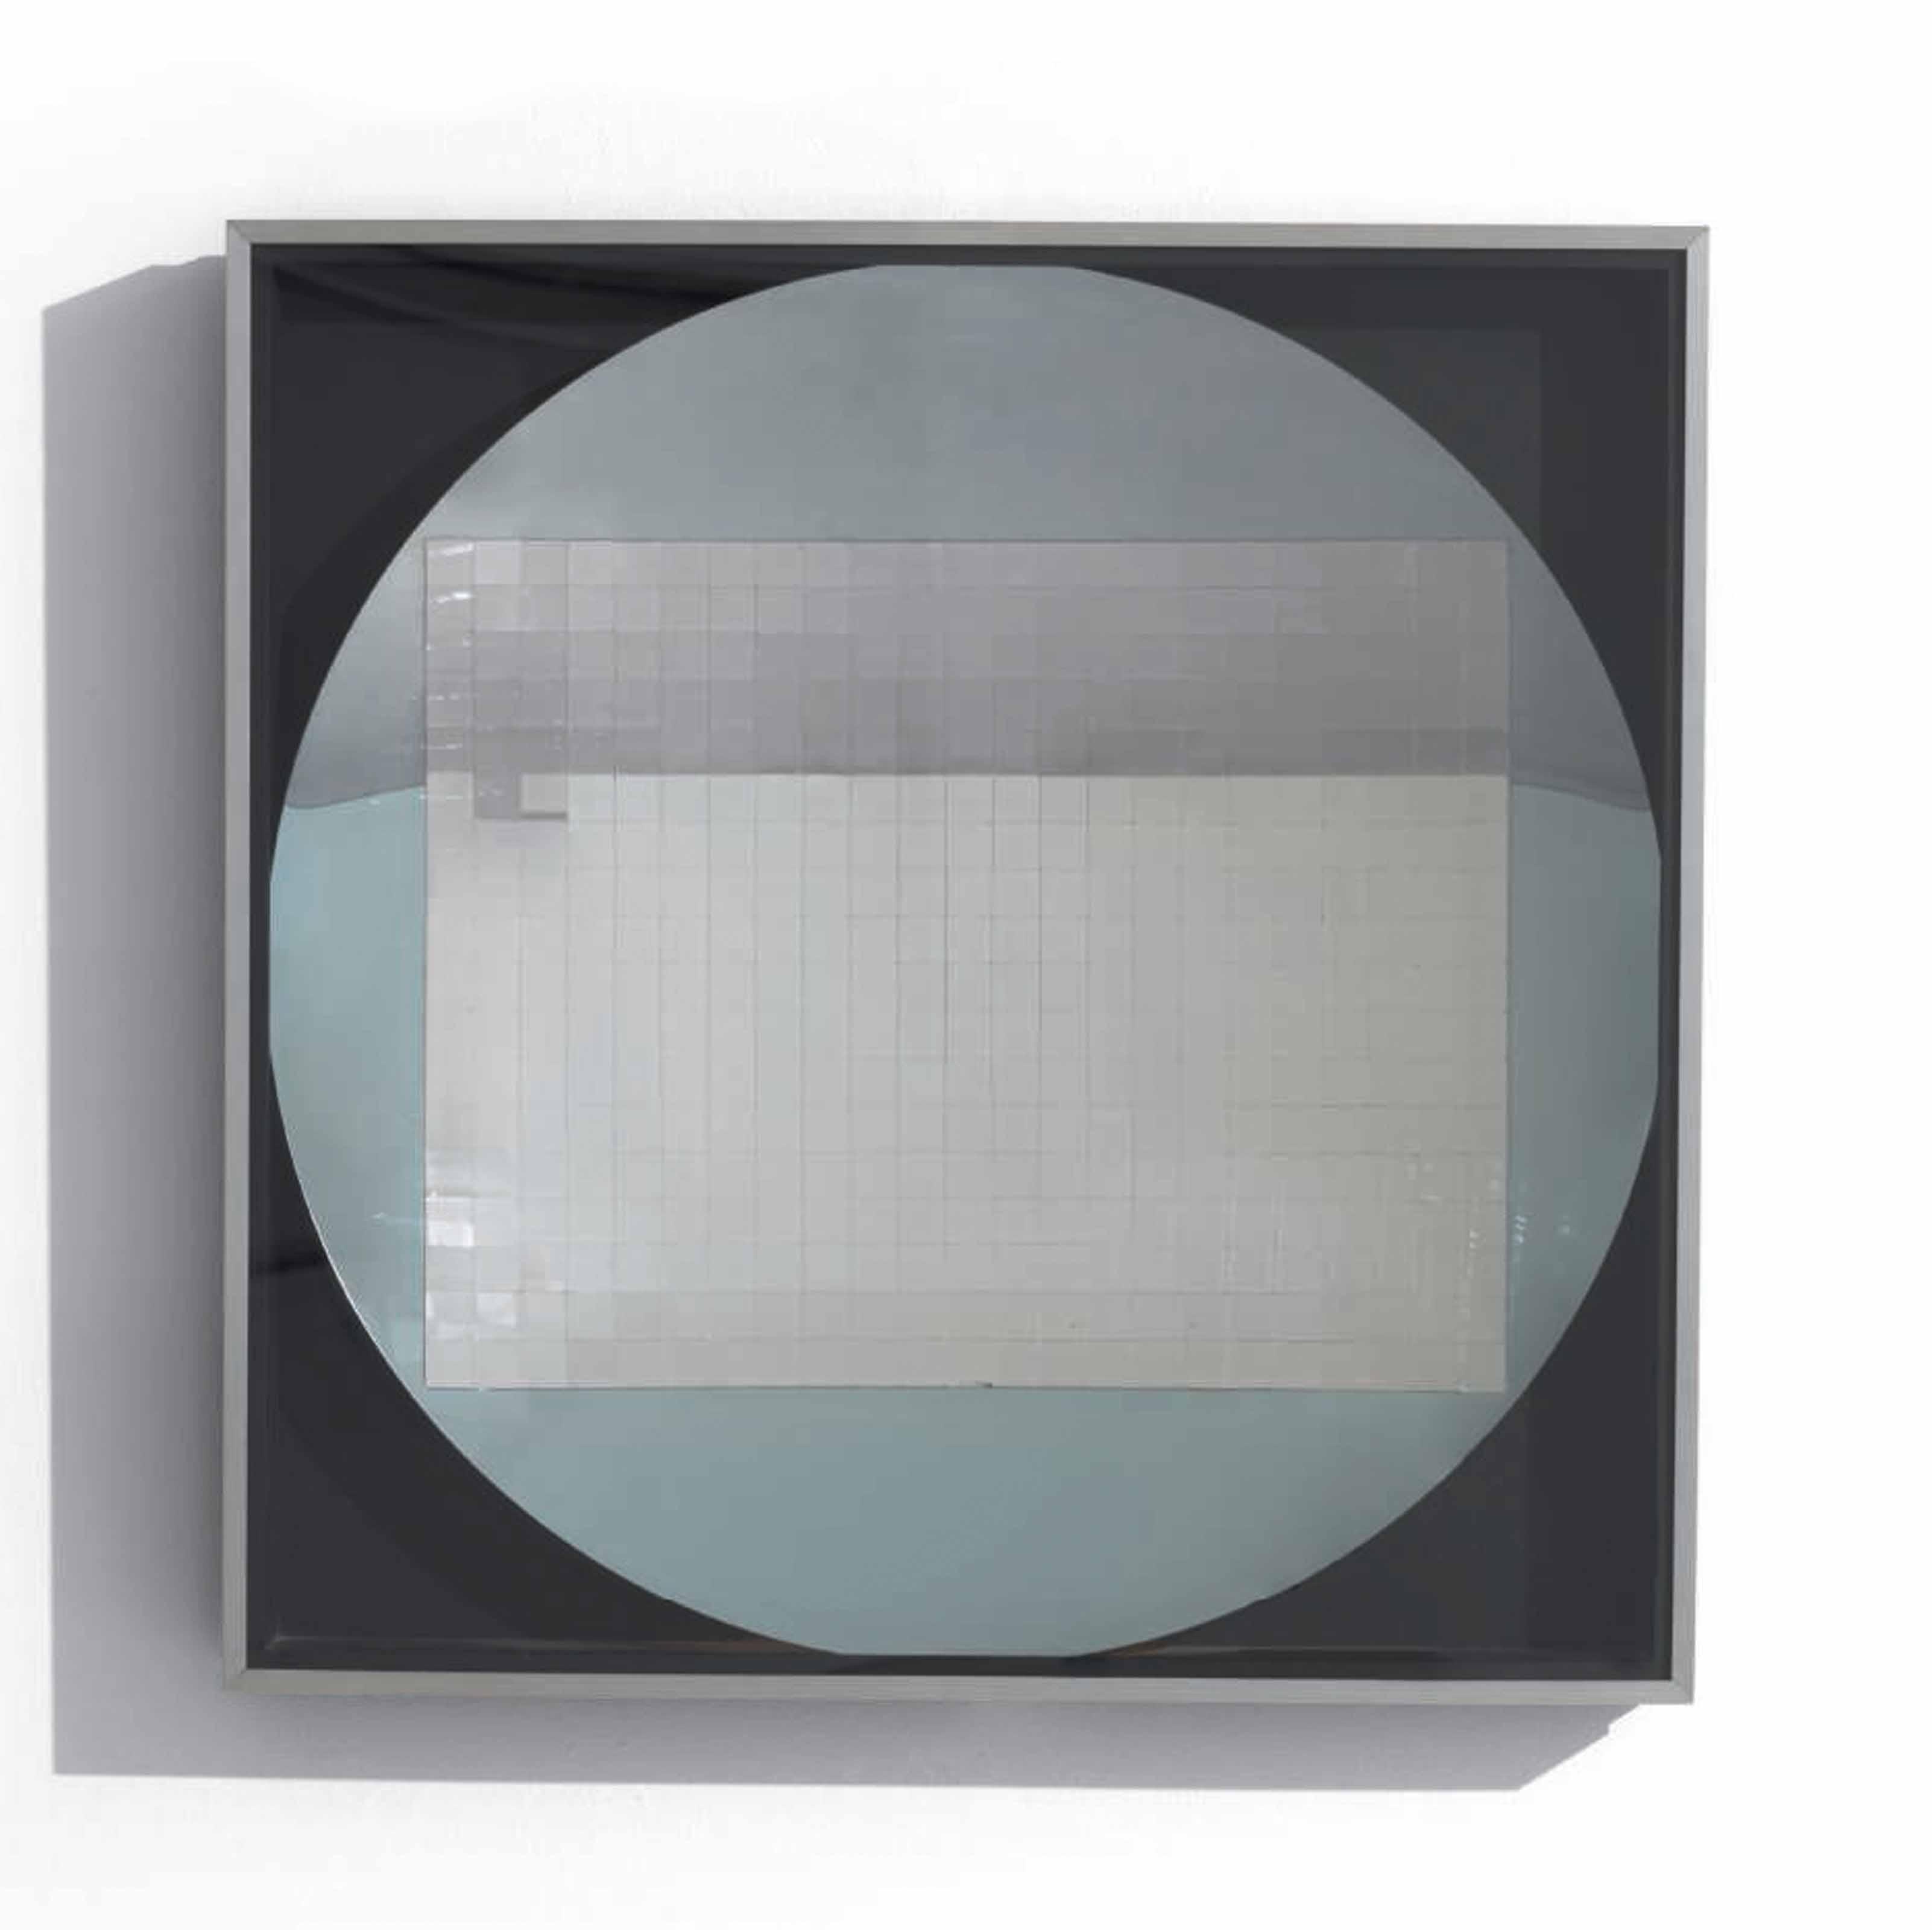 Hohlspiegelobjekt (Concave Mirror Object)